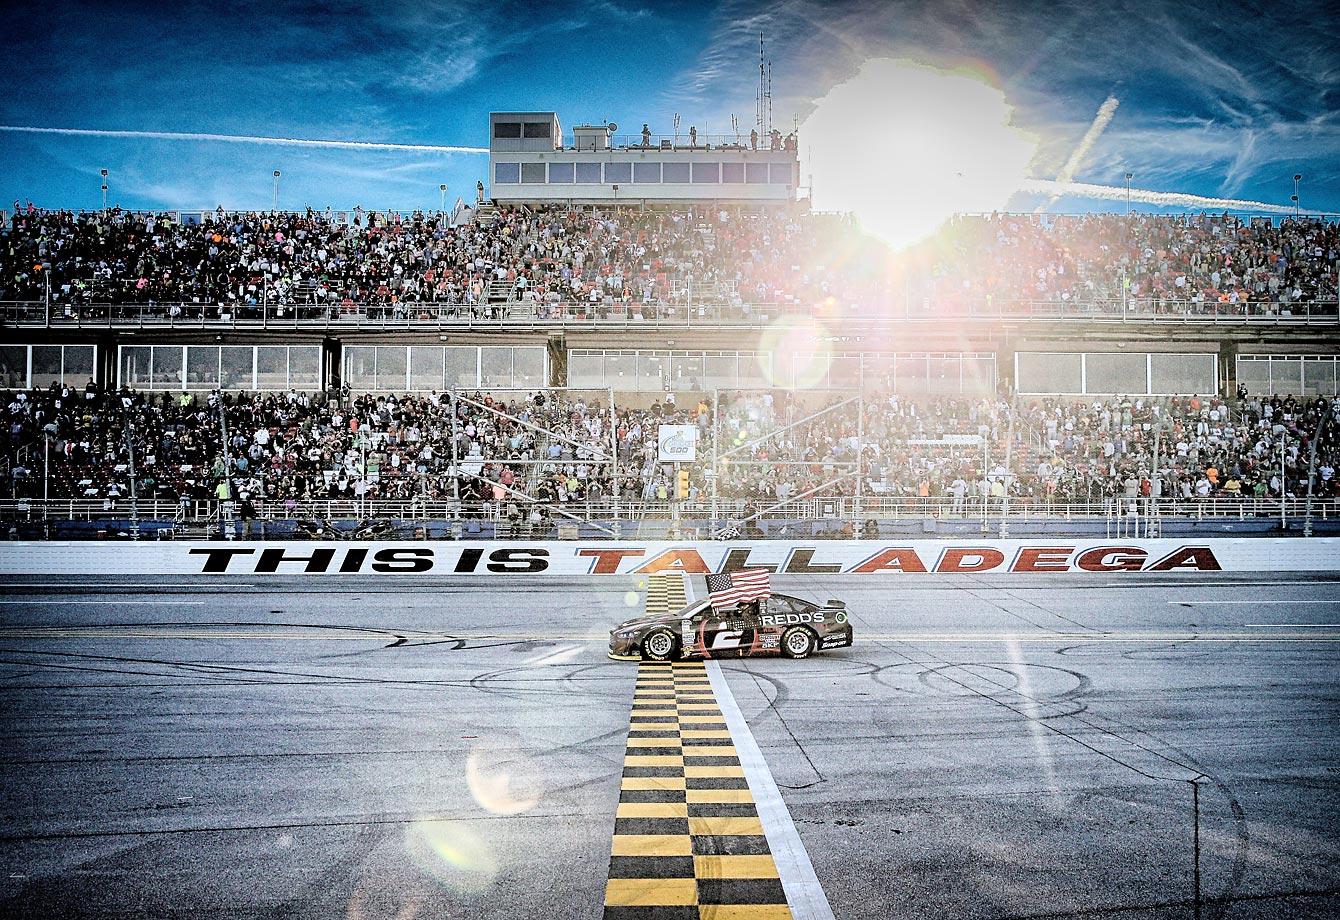 Brad Keselowski celebrates after winning a NASCAR Sprint Cup Series race at Talladega Superspeedway.